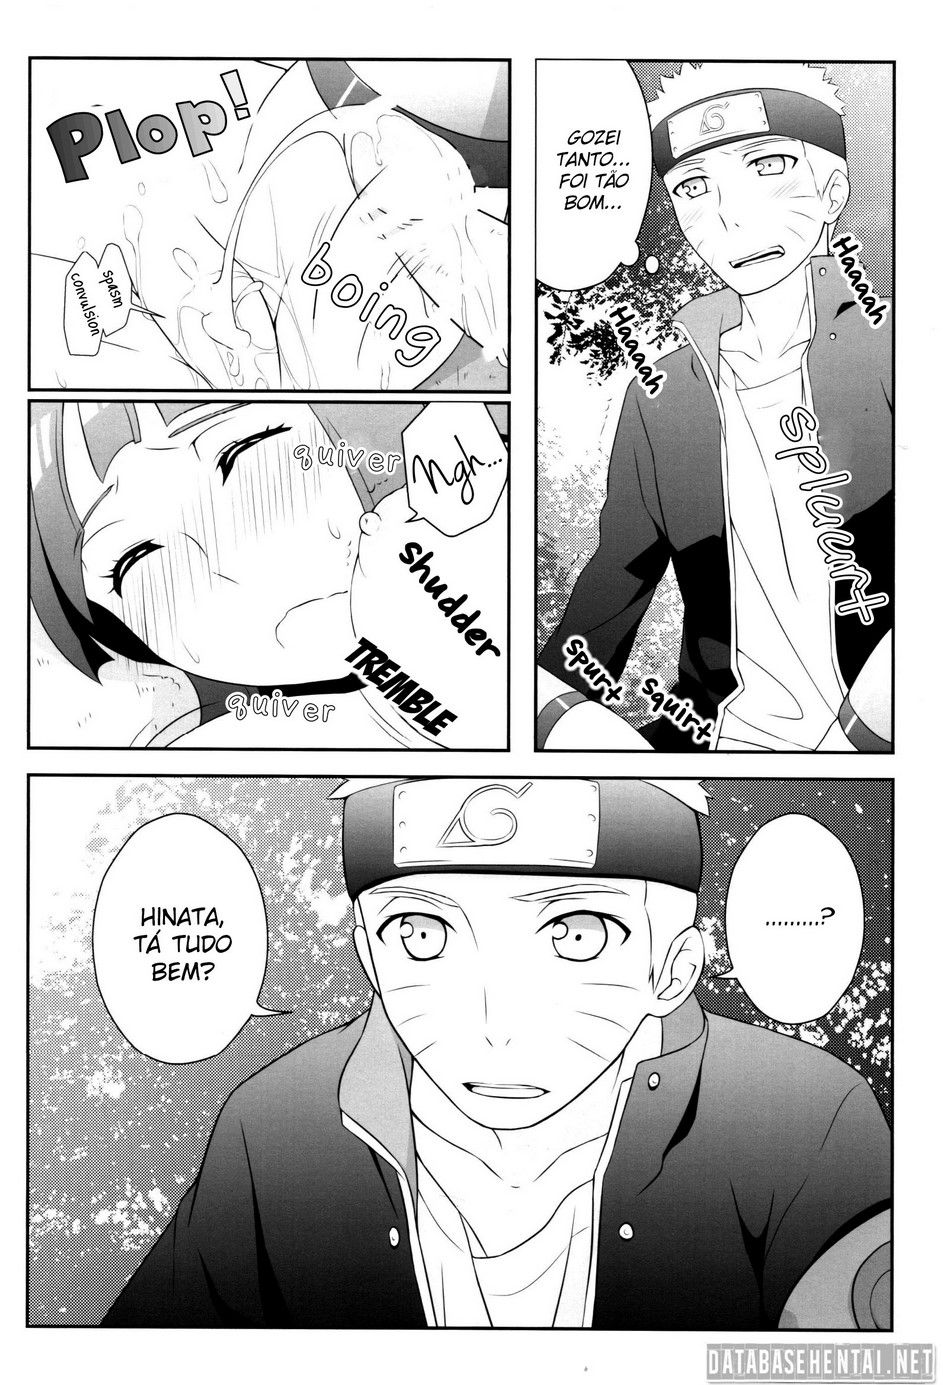 Naruto pornô na missão com Hinata - Foto 11